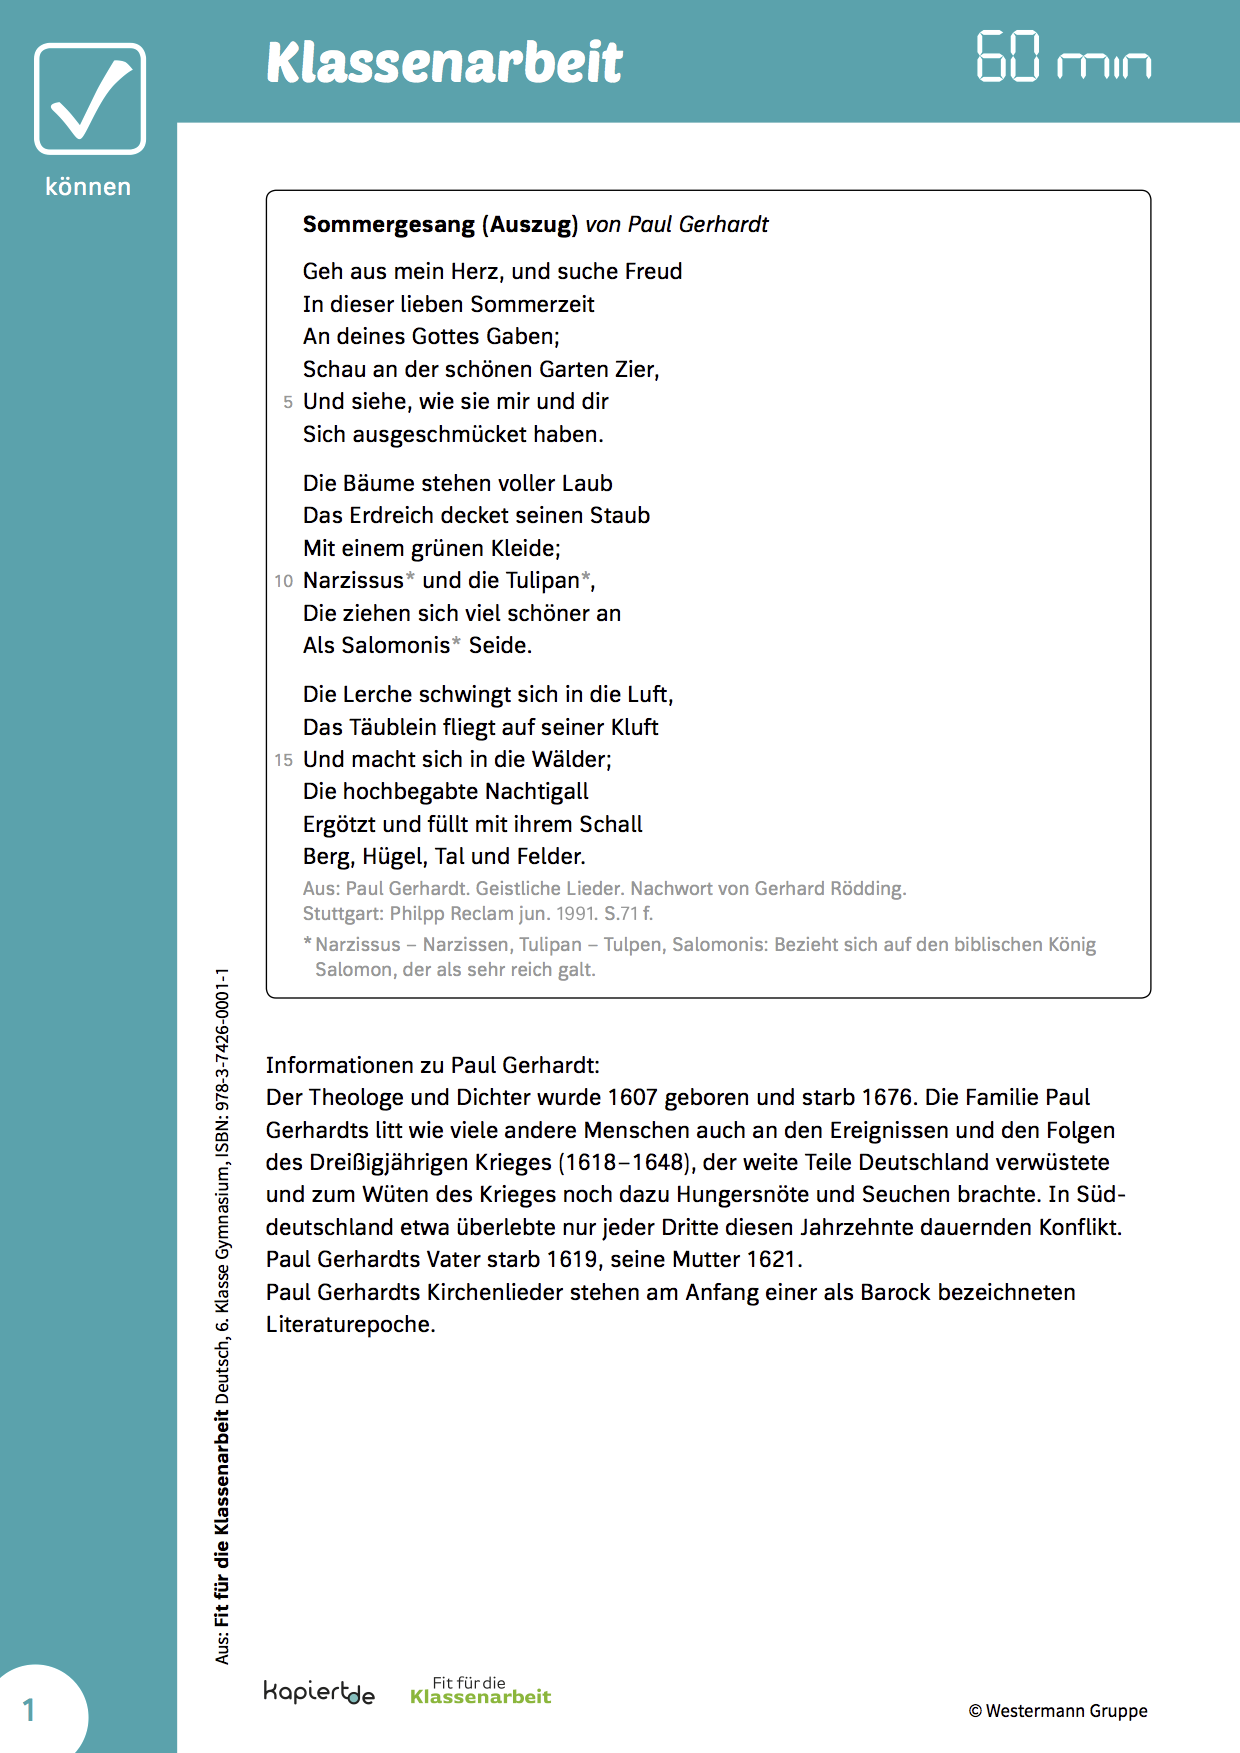 Gedichtinterpretation 4